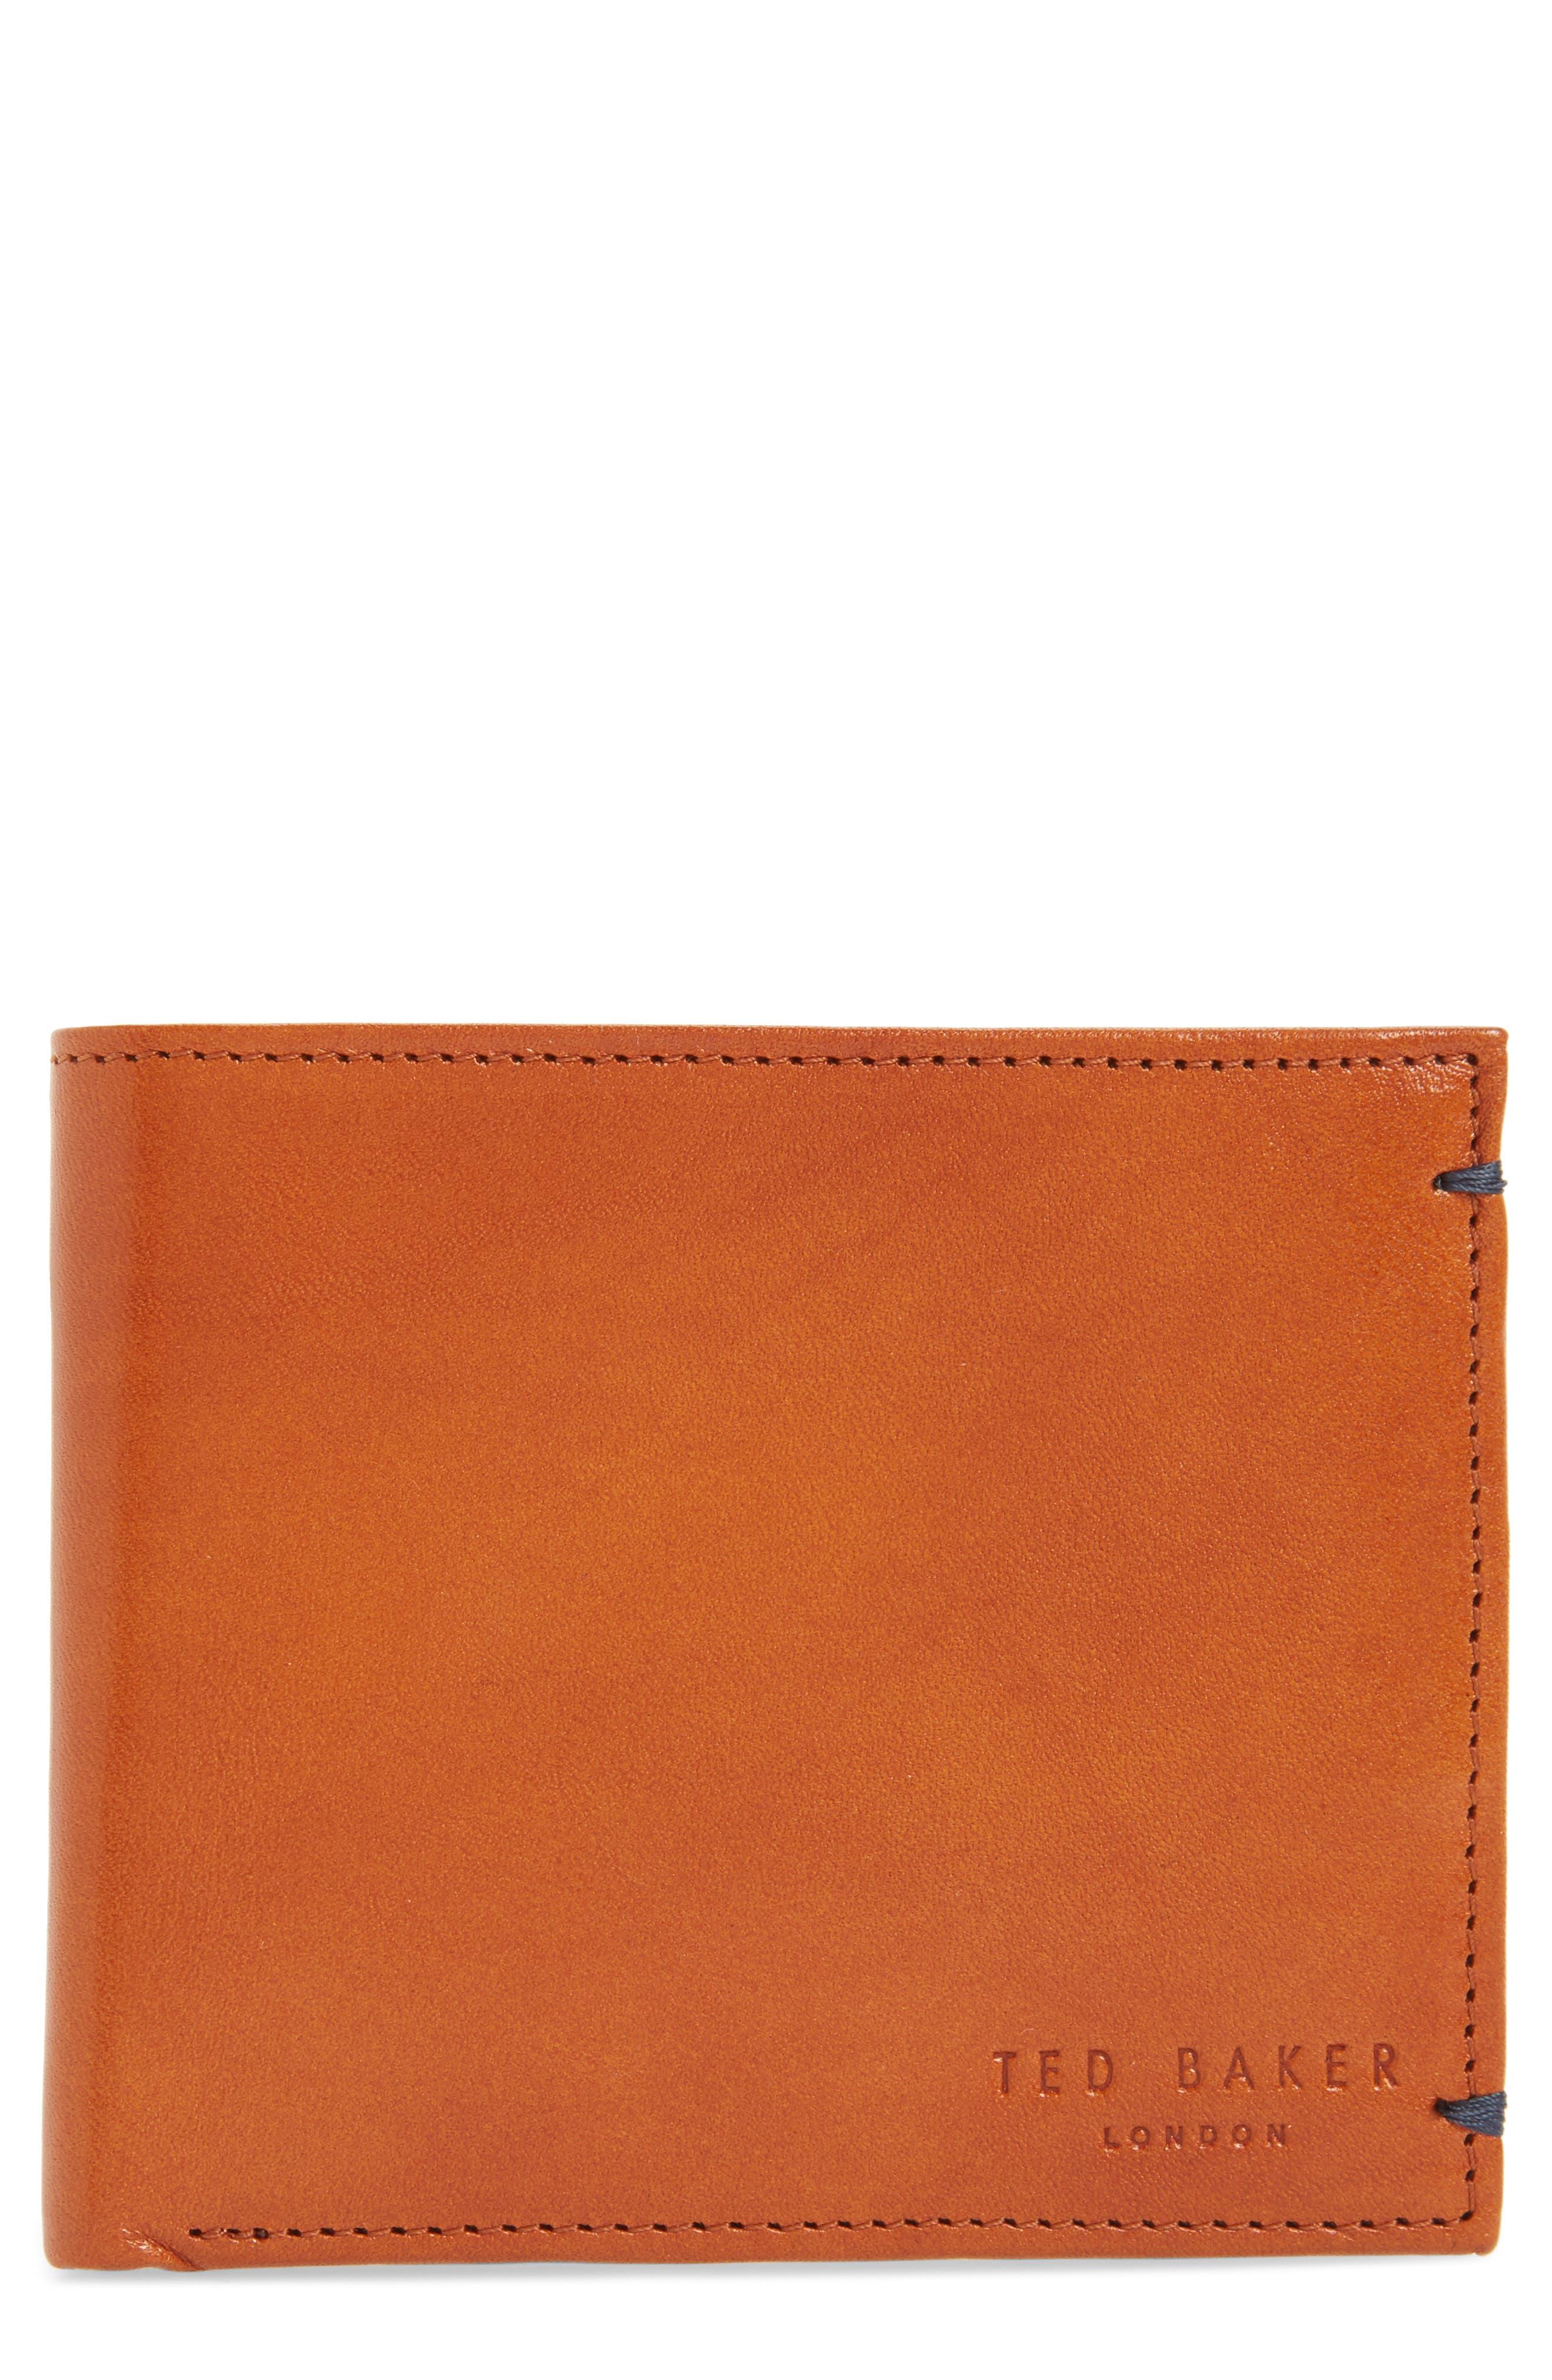 Vivid Leather Wallet,                             Main thumbnail 1, color,                             217